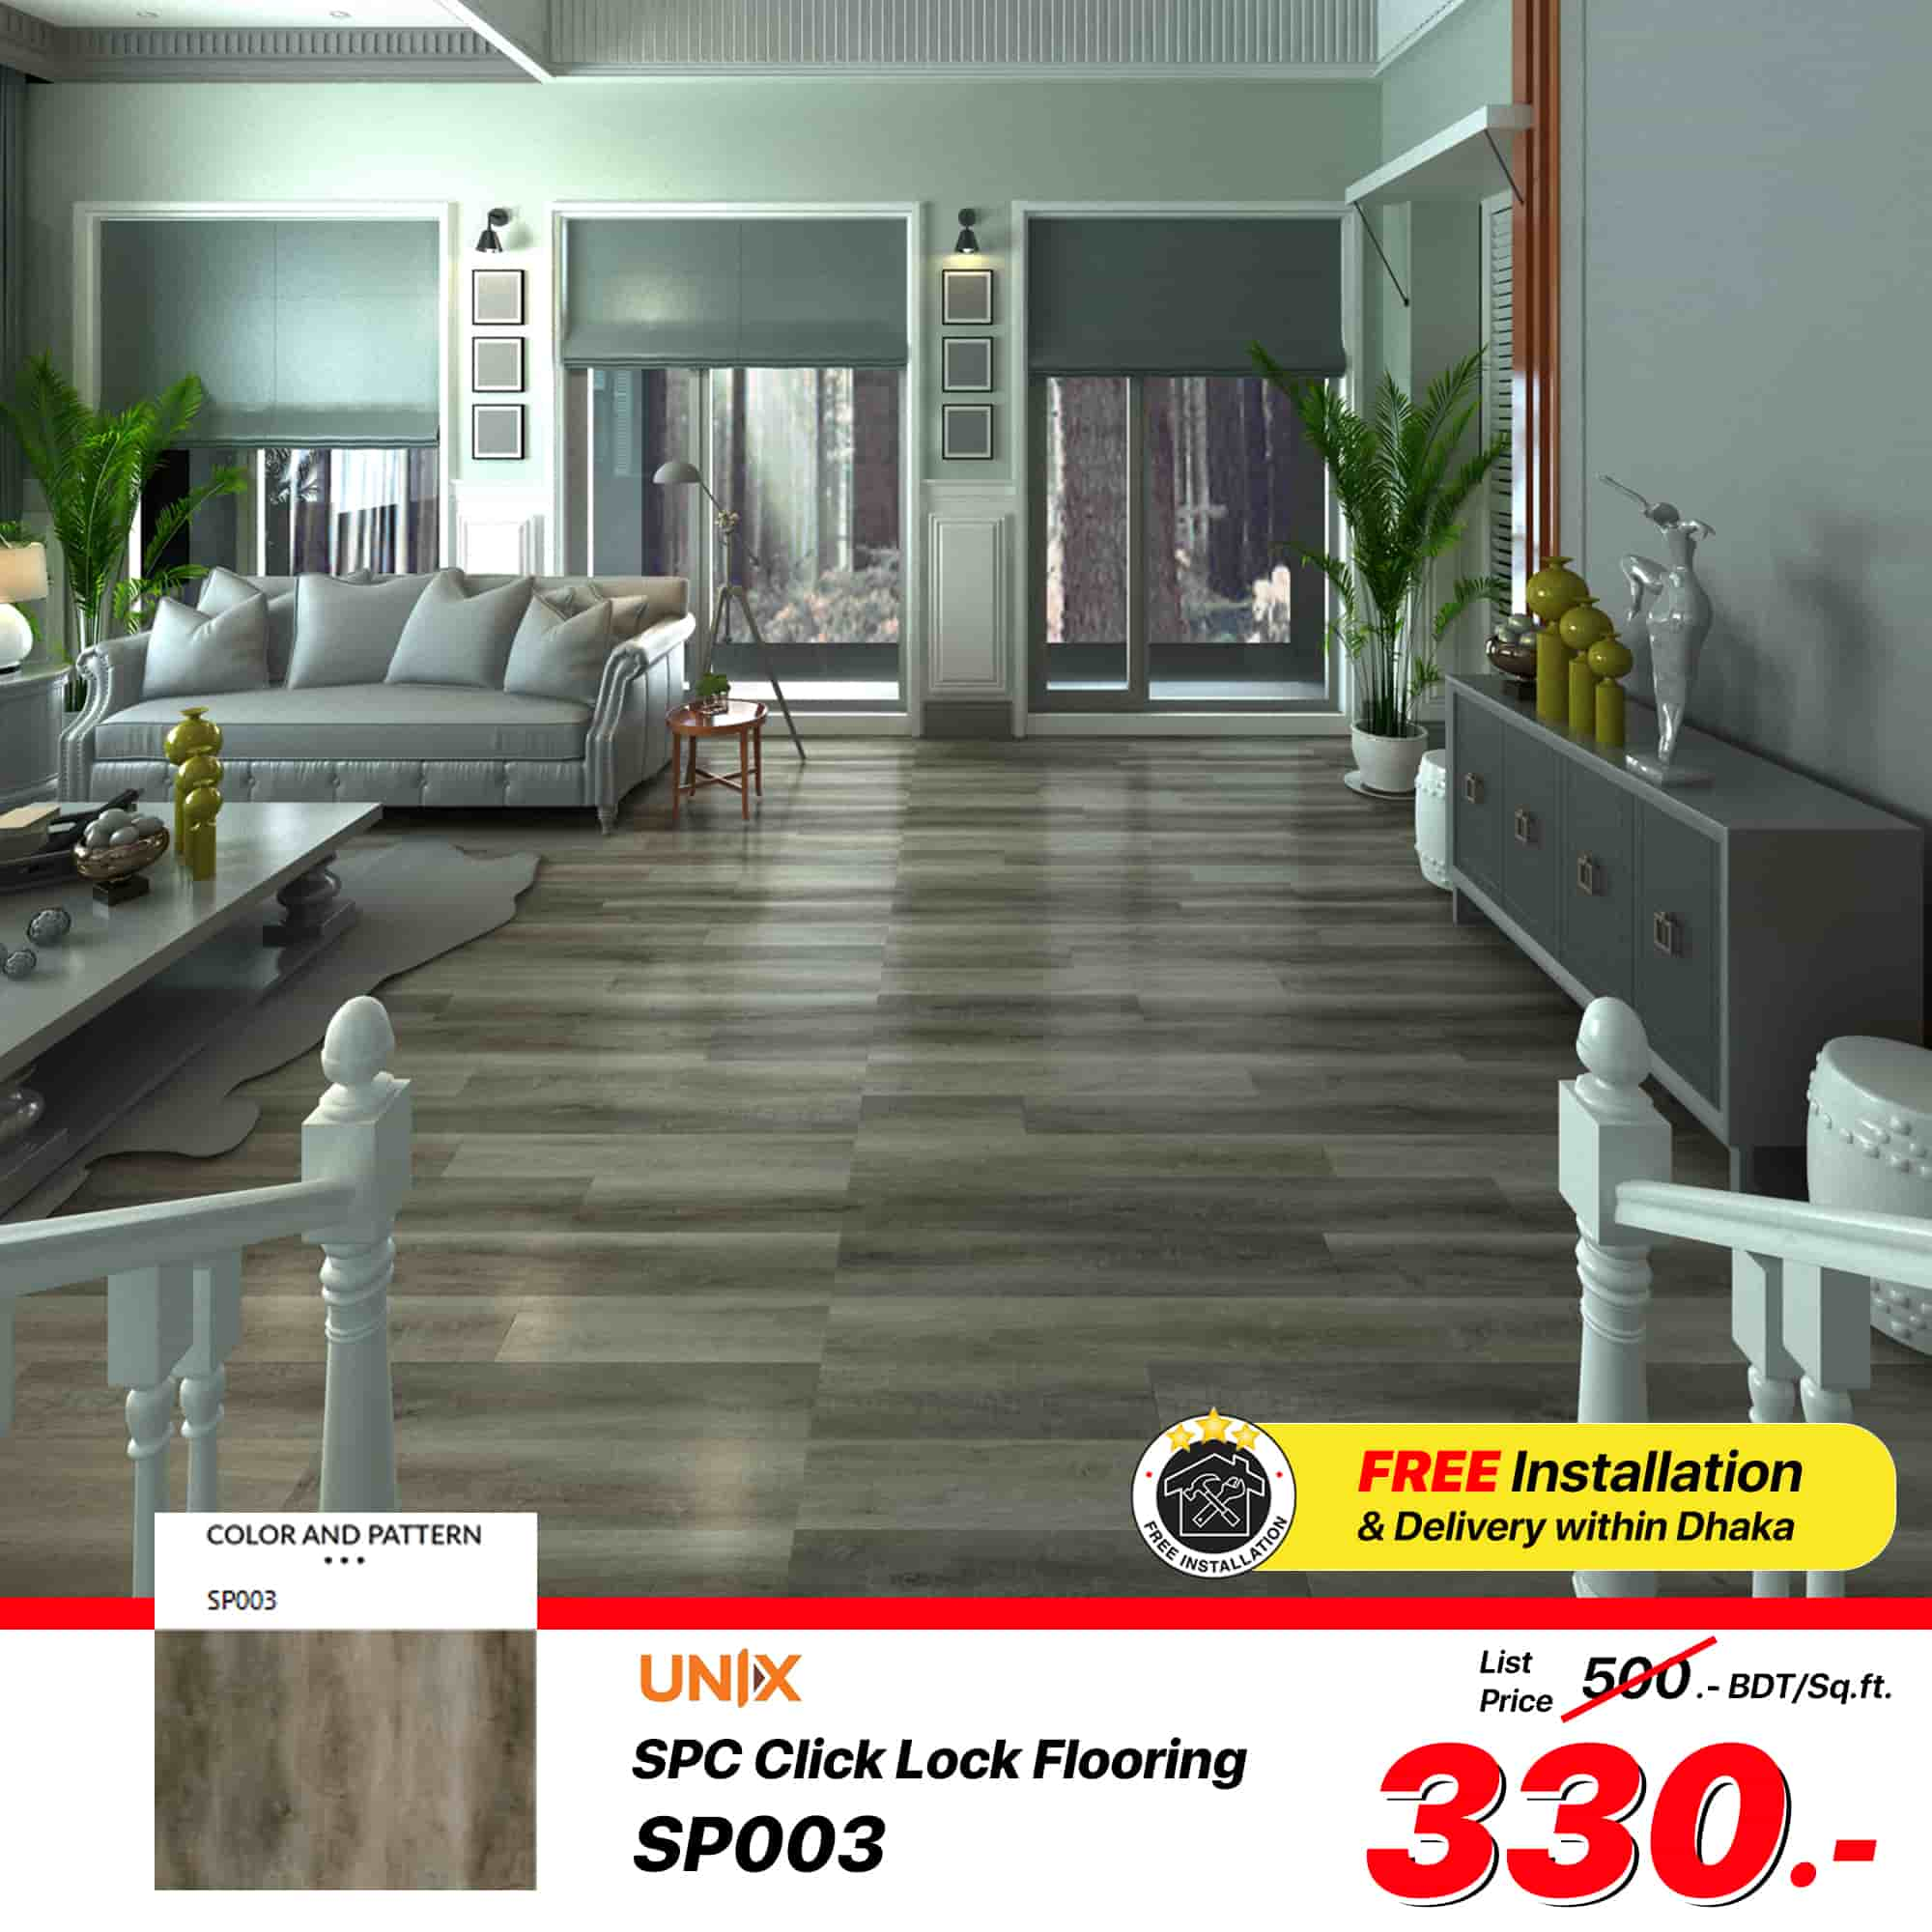 https://www.zmartbuild.com/product/spc-click-lock-flooring-sp001/